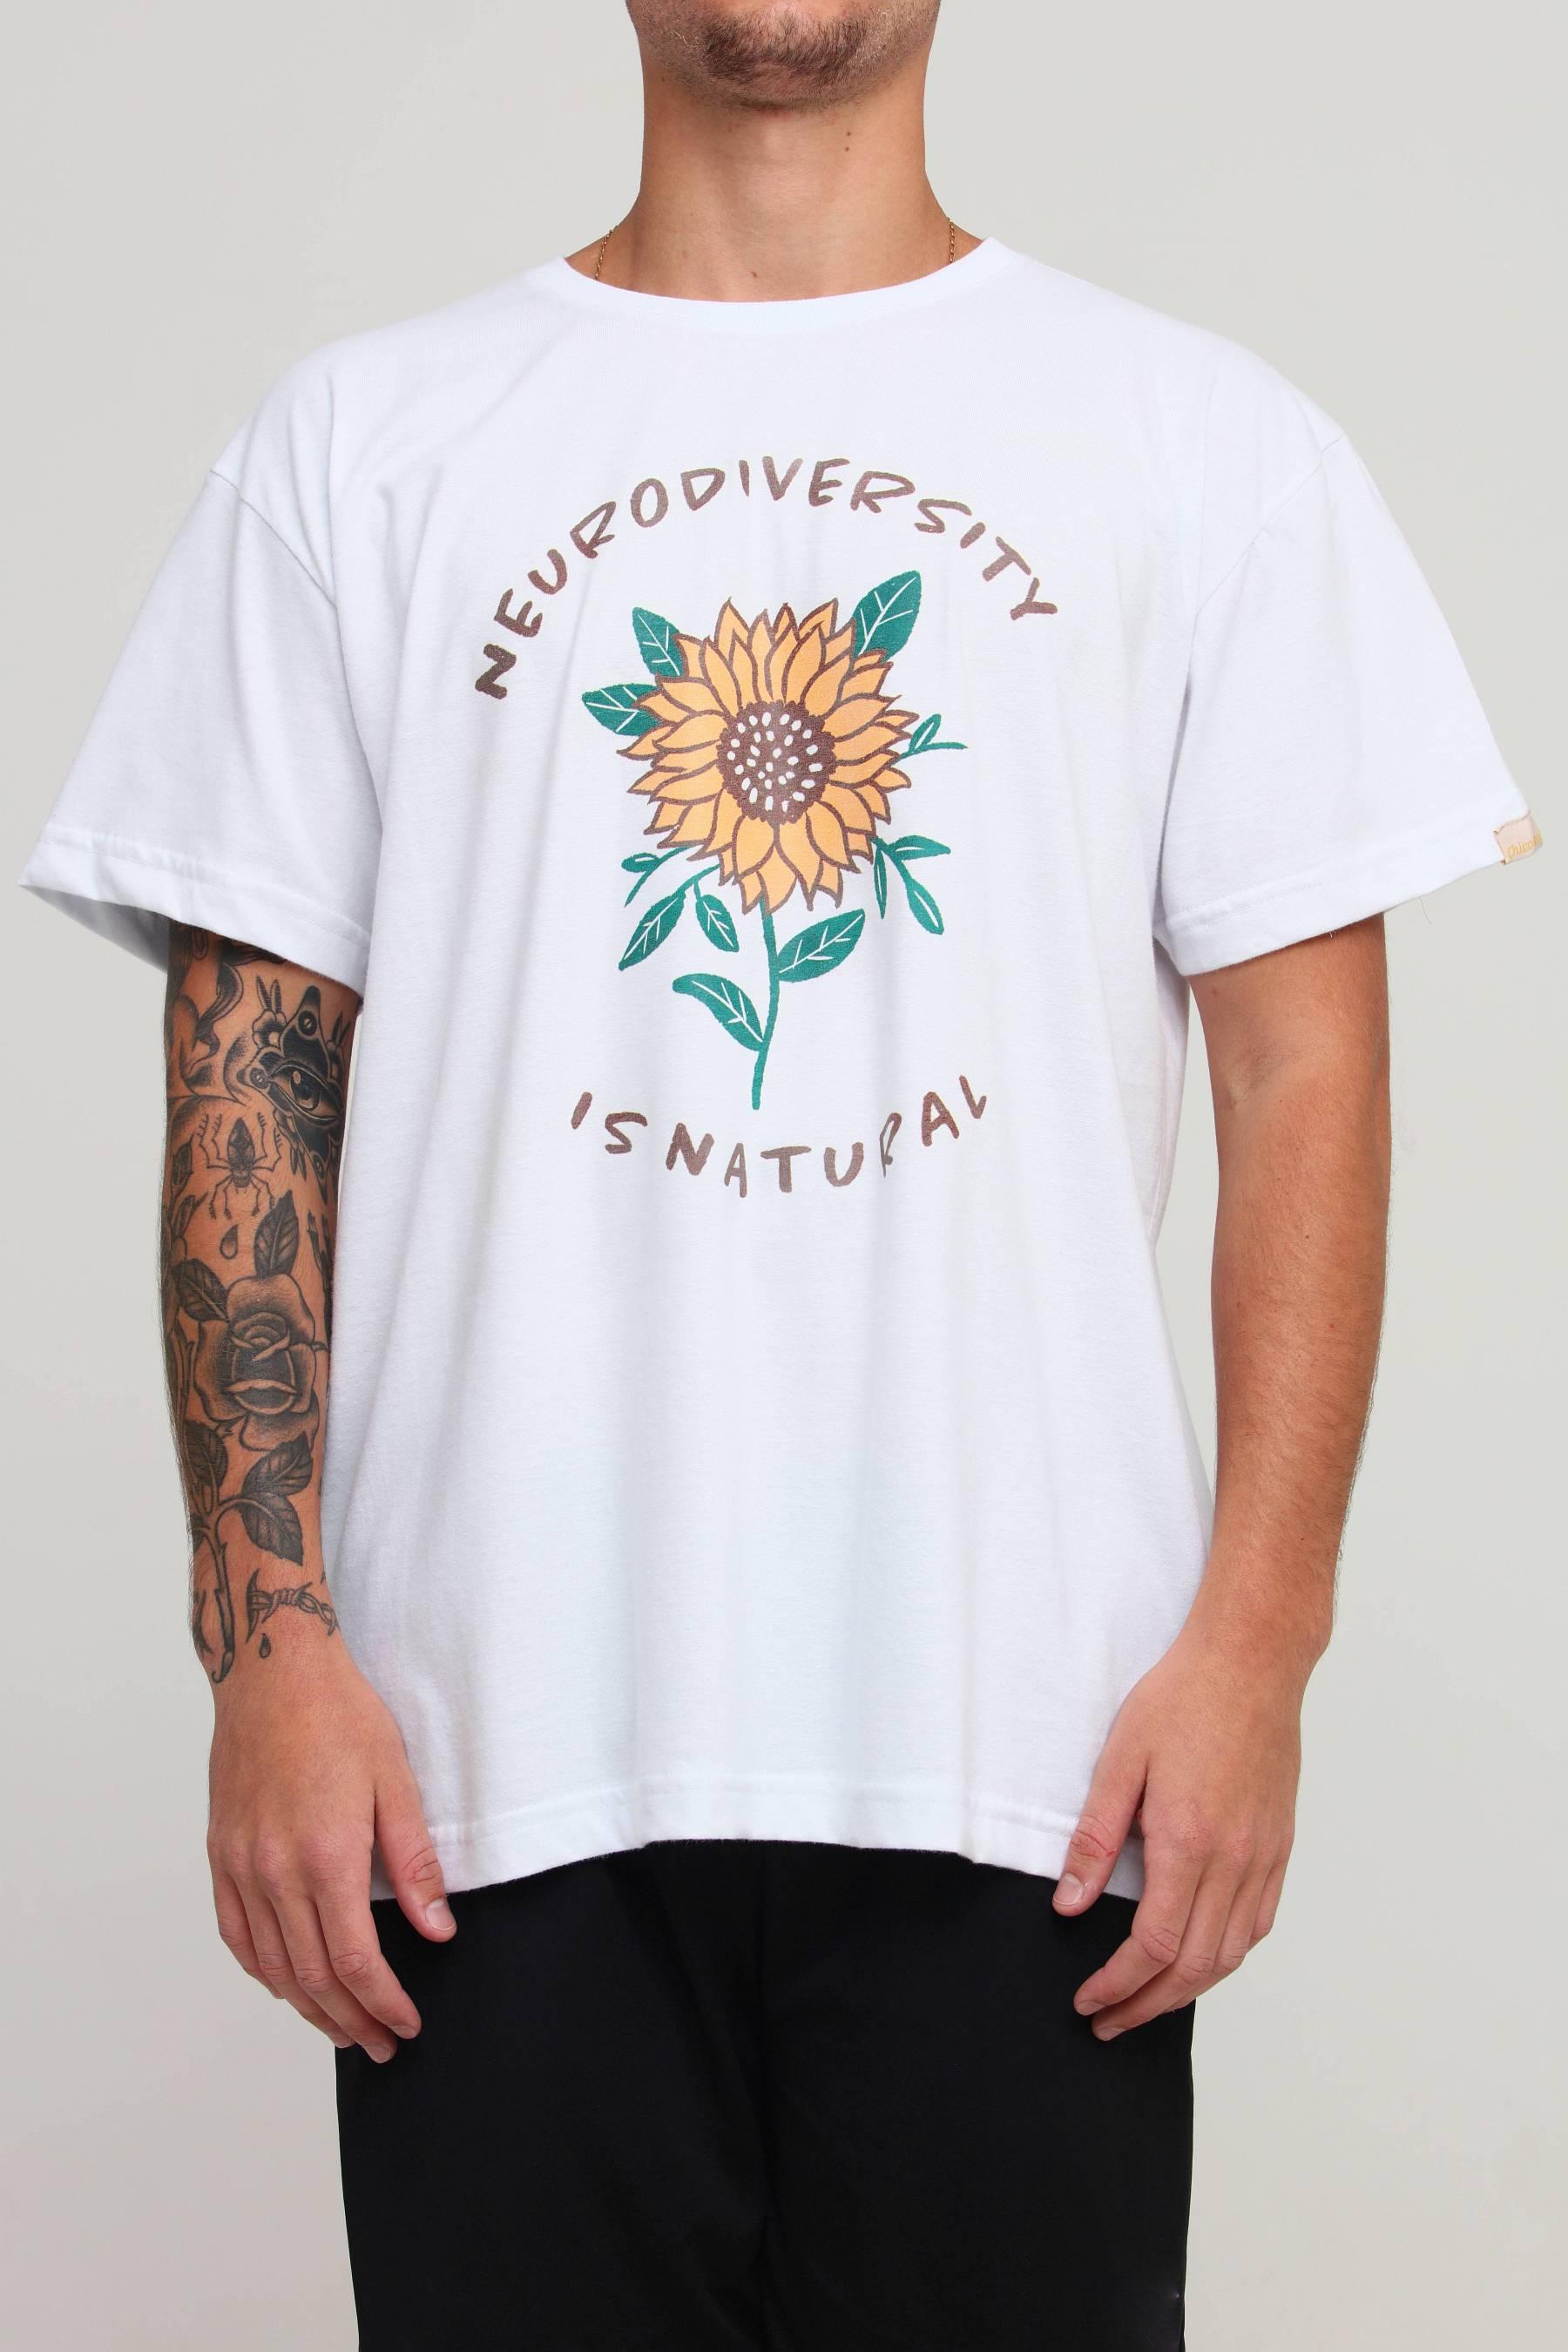 Camiseta Neurodiversity is Natural